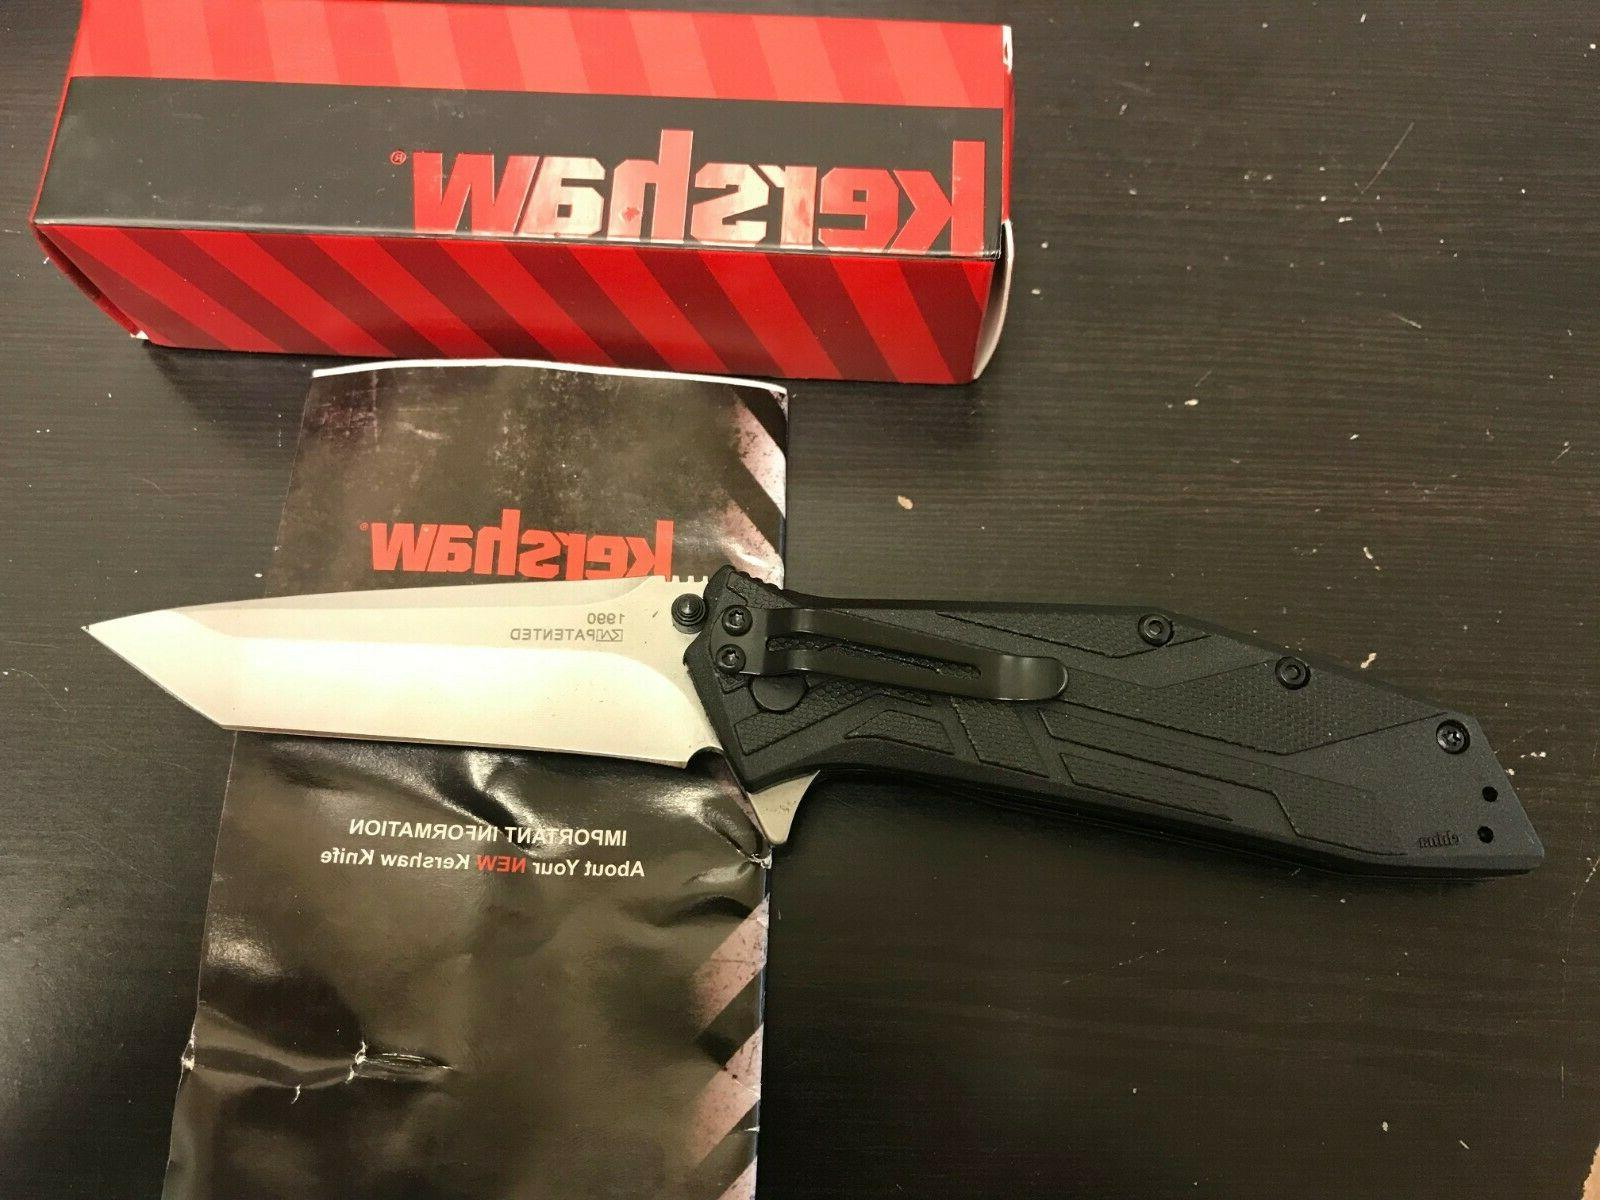 KERSHAW BRAWLER 1990 Pocket Knife